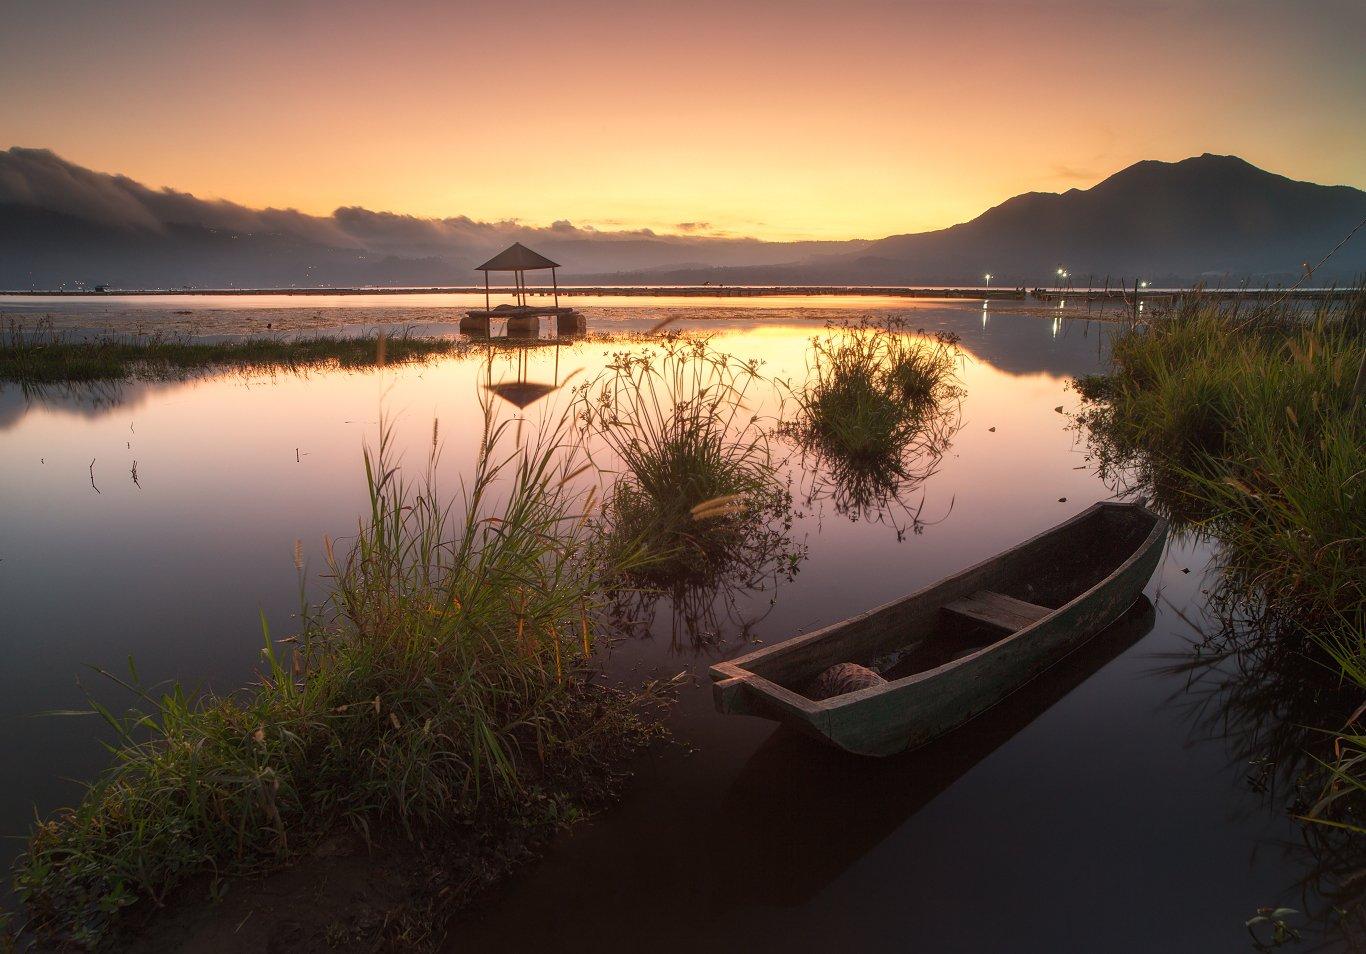 батур, индонезия, бали, закат, лодка, природа, Сергей Луканкин